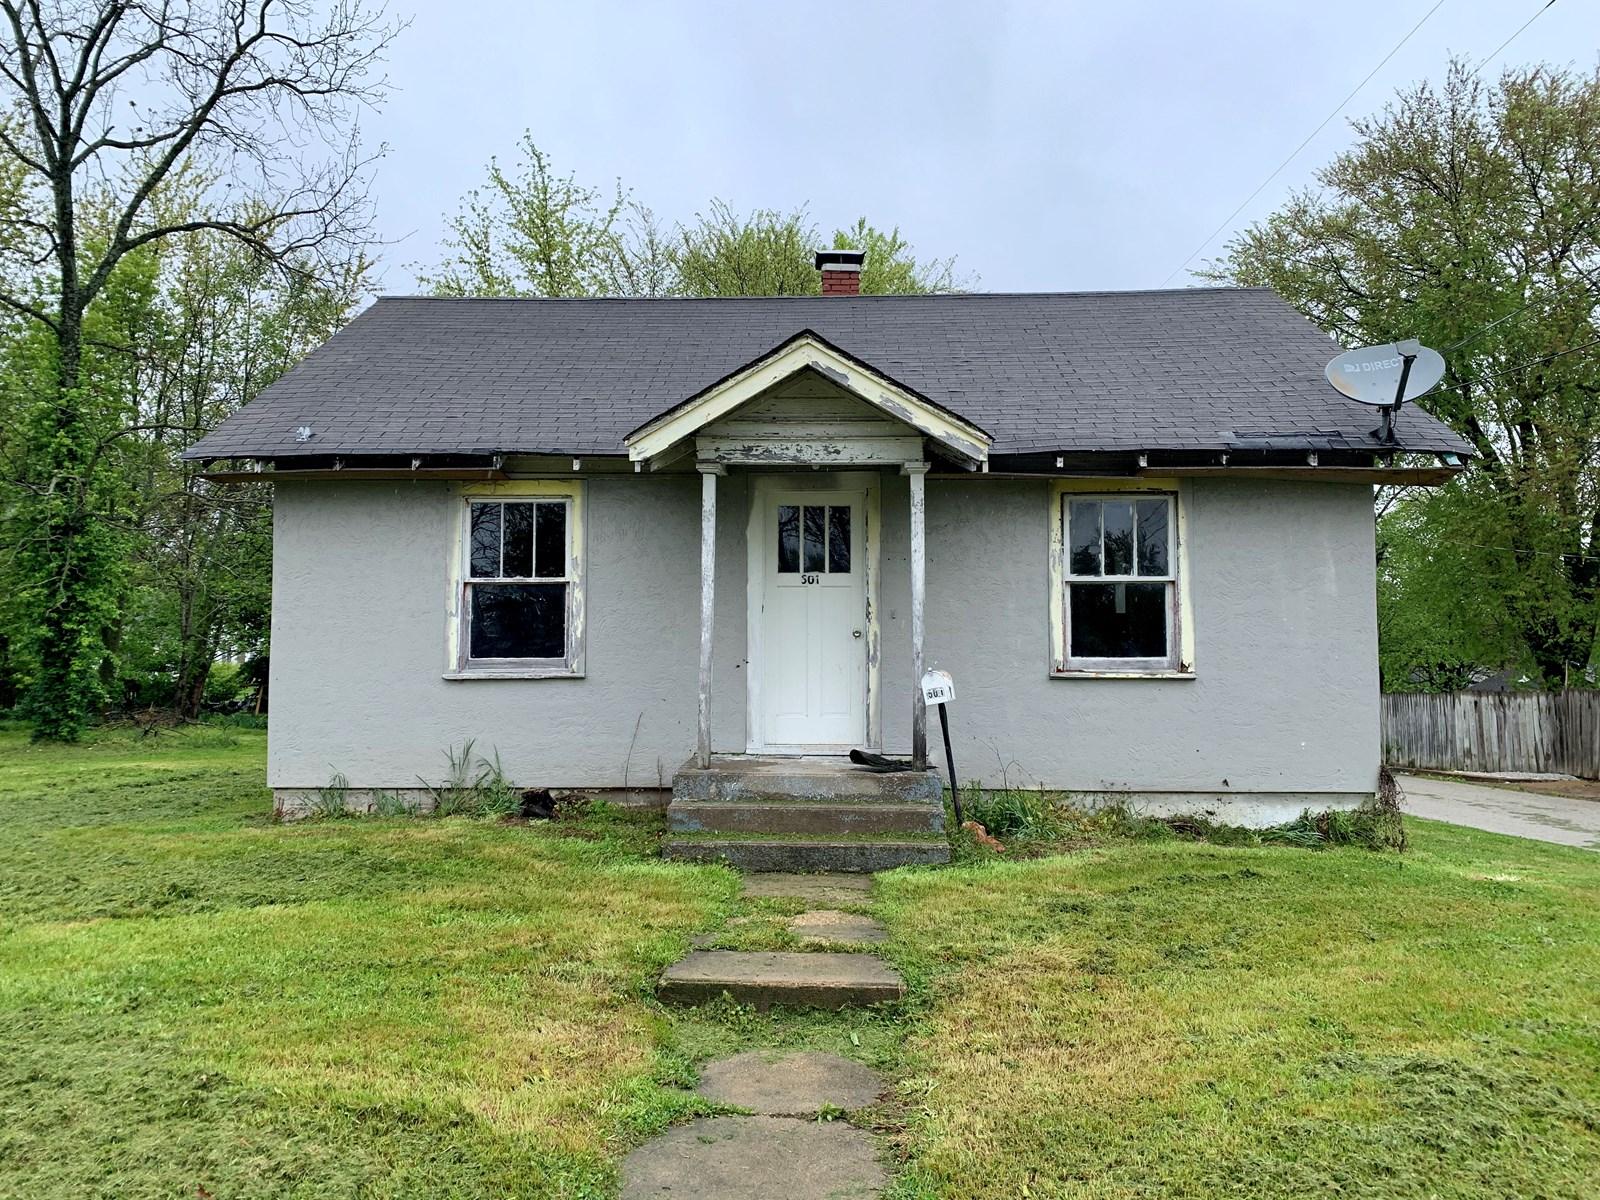 Home For Sale in Mountain Grove, Missouri!